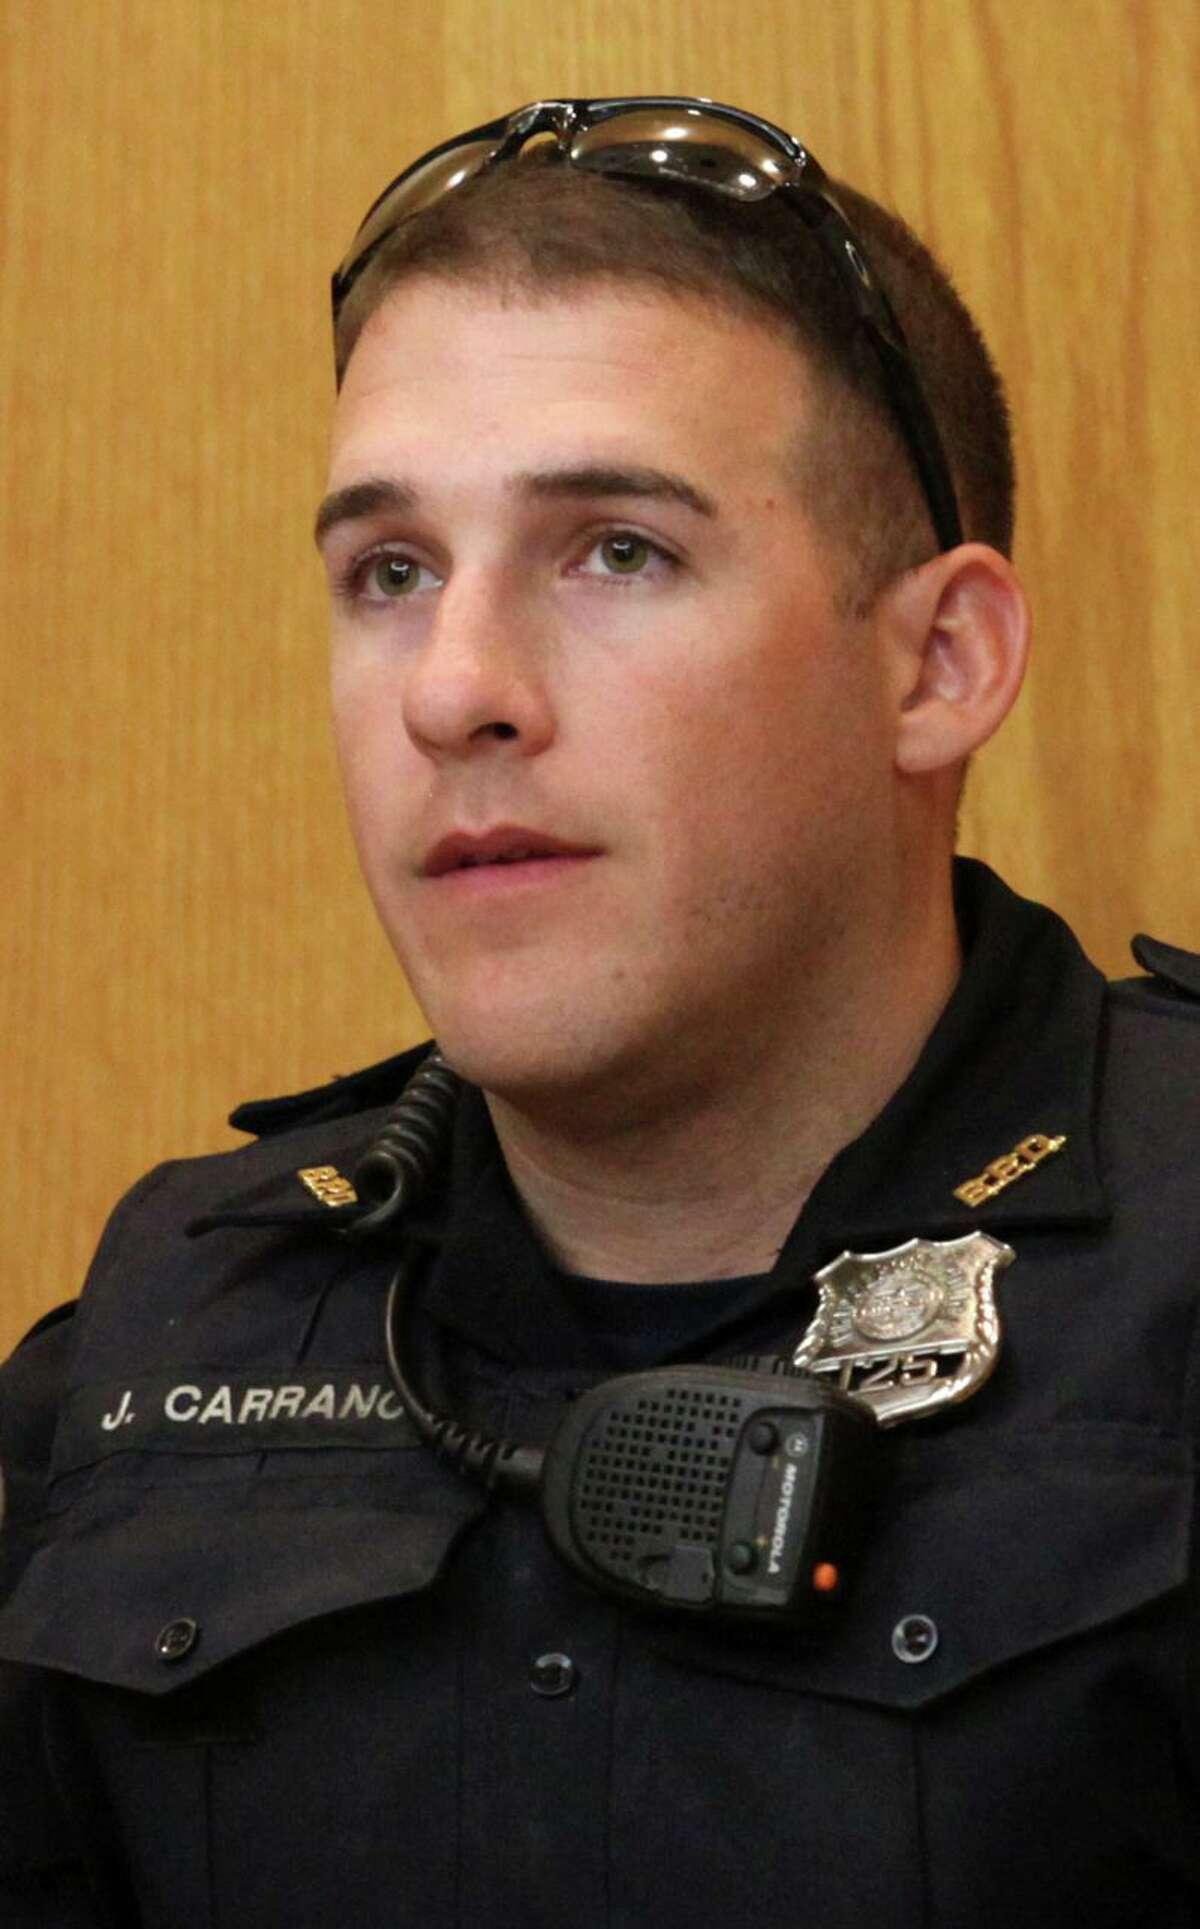 Former Bridgeport police officer John Carrano